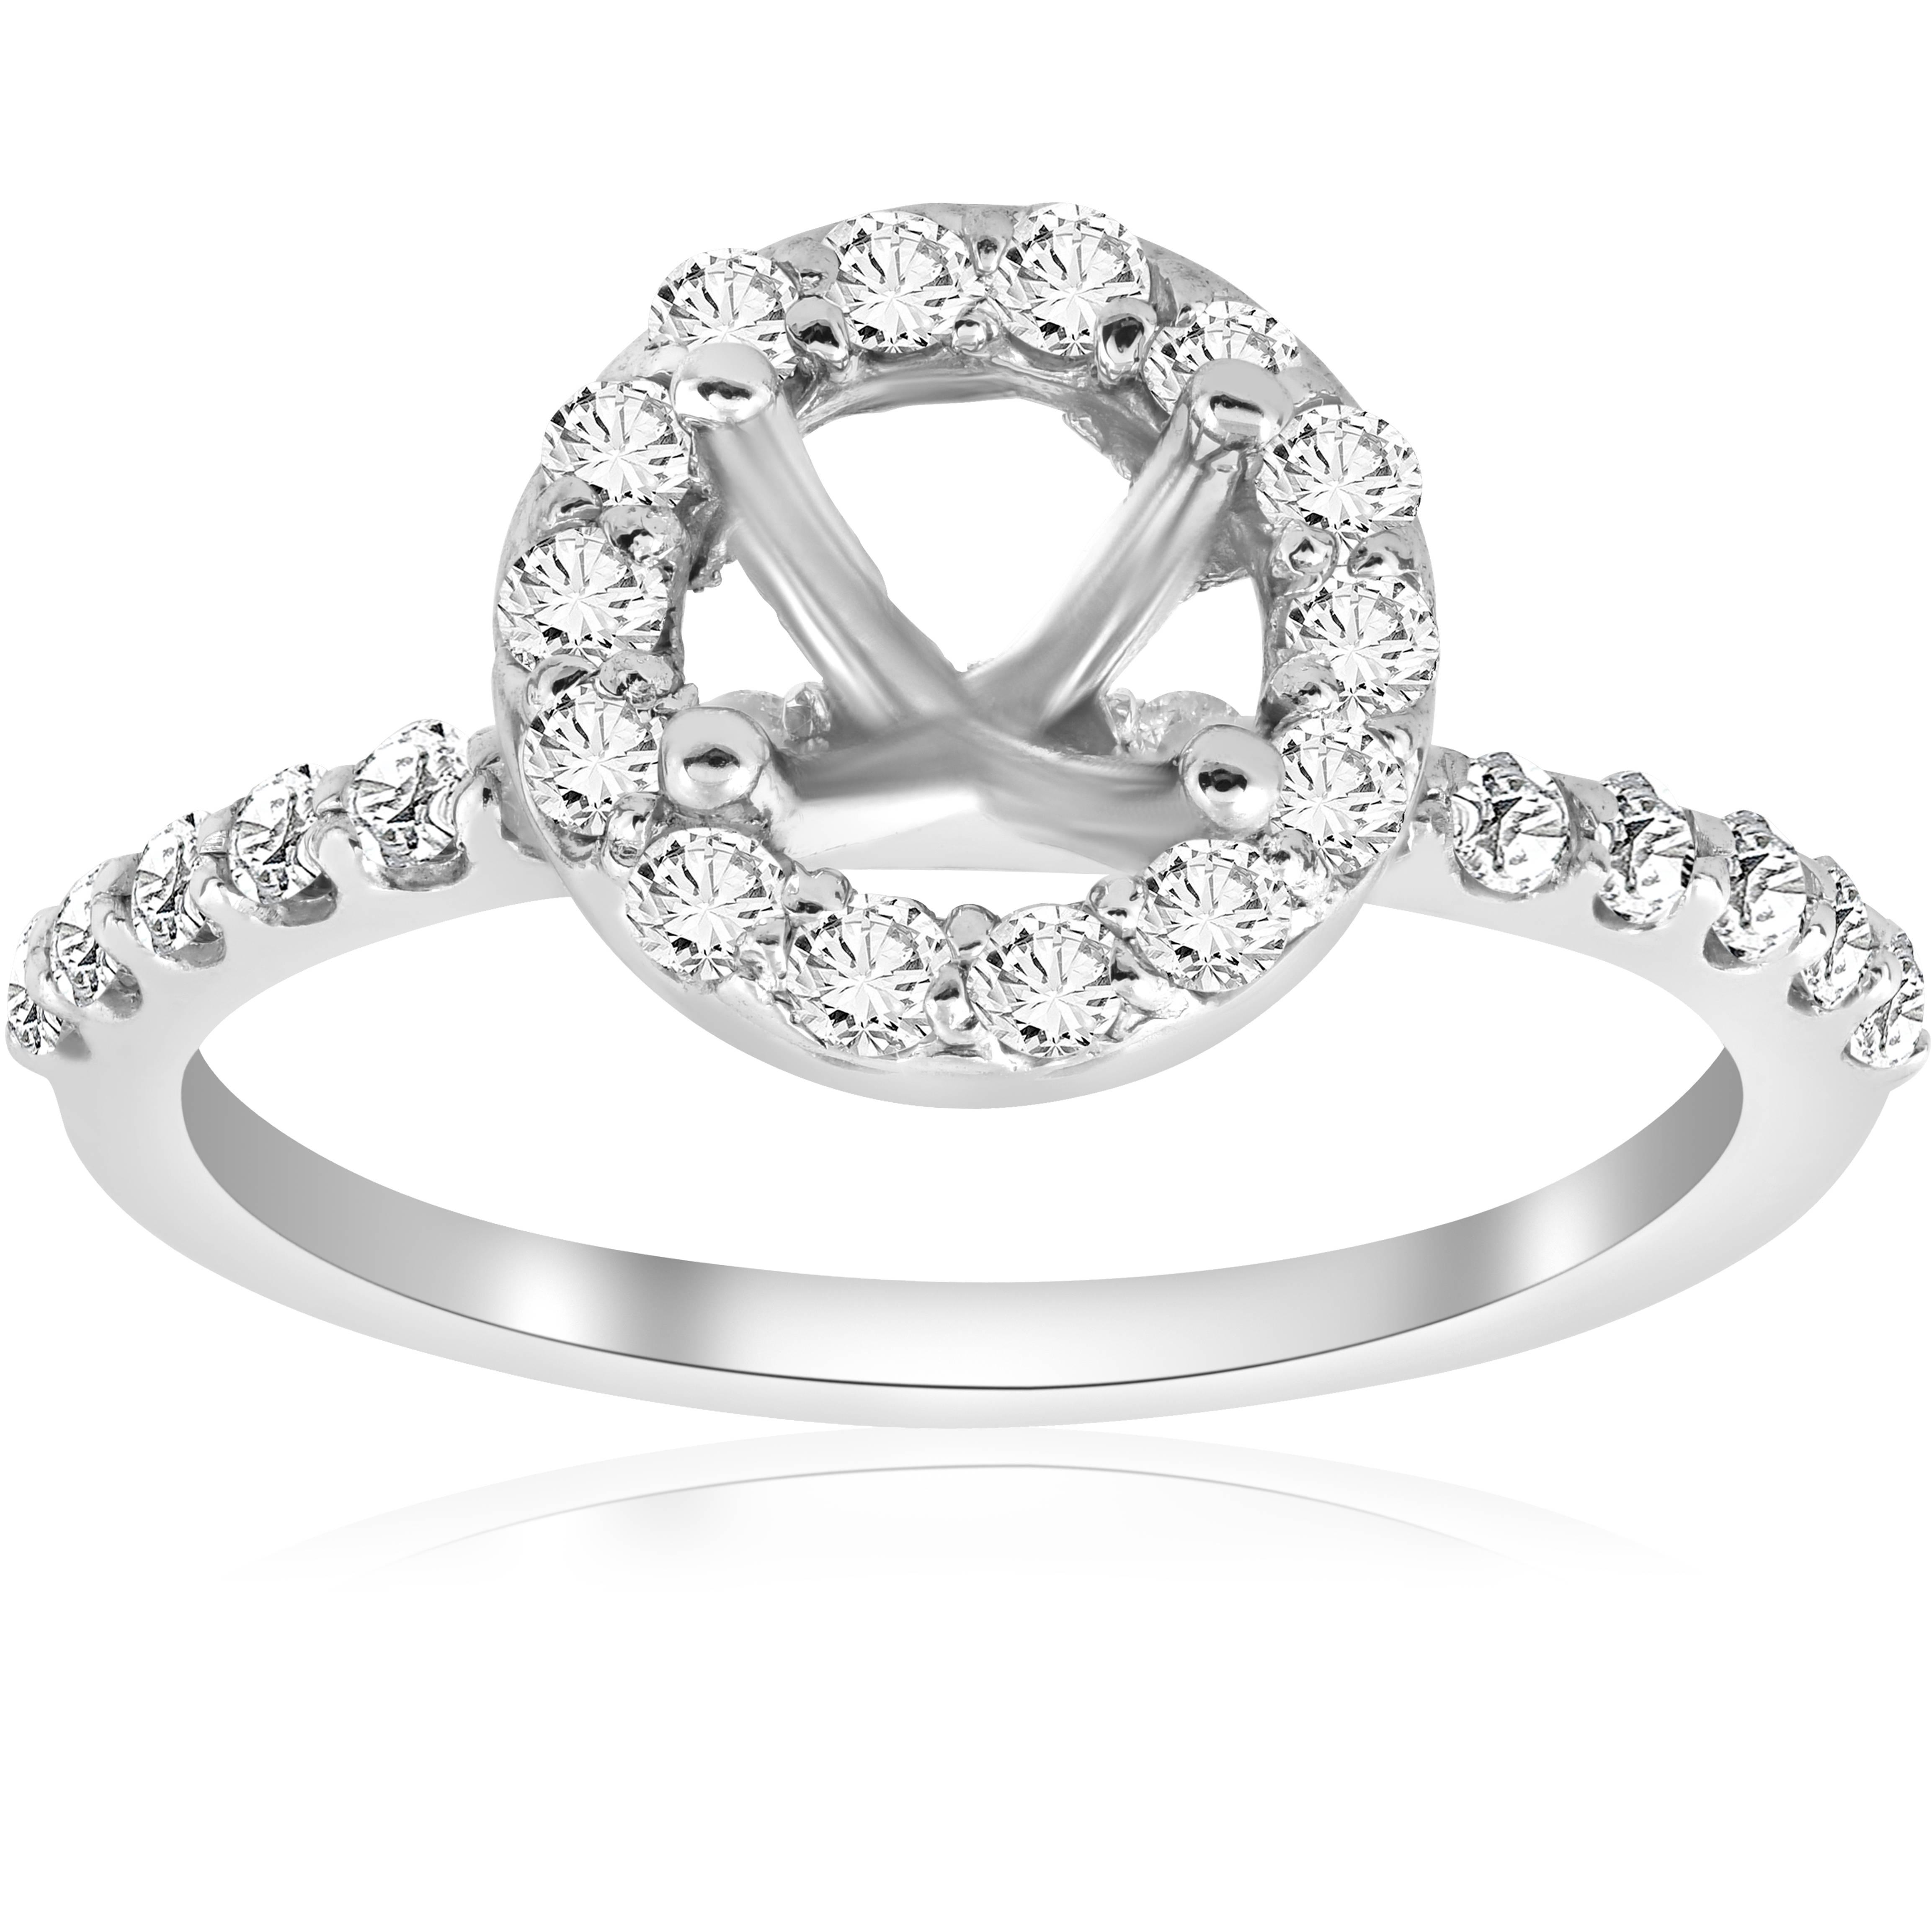 1/2ct Diamond Halo Engagement Ring Setting 14K White Gold Semi Mount Jewelry - image 3 of 3